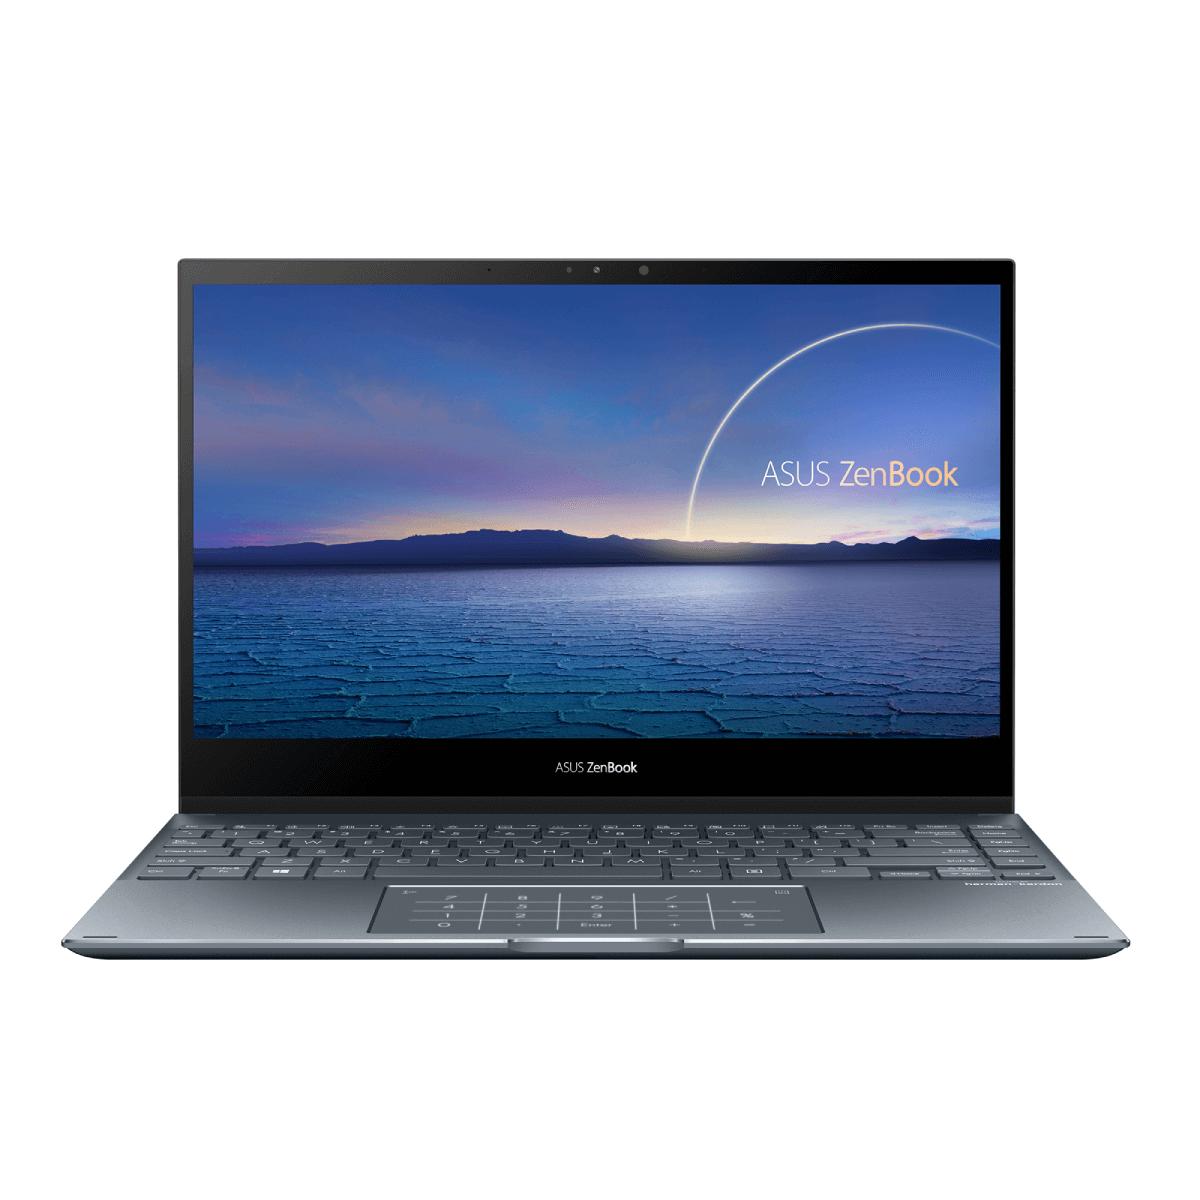 ASUS ZenBook Filp 13 (i7, Pine Grey)